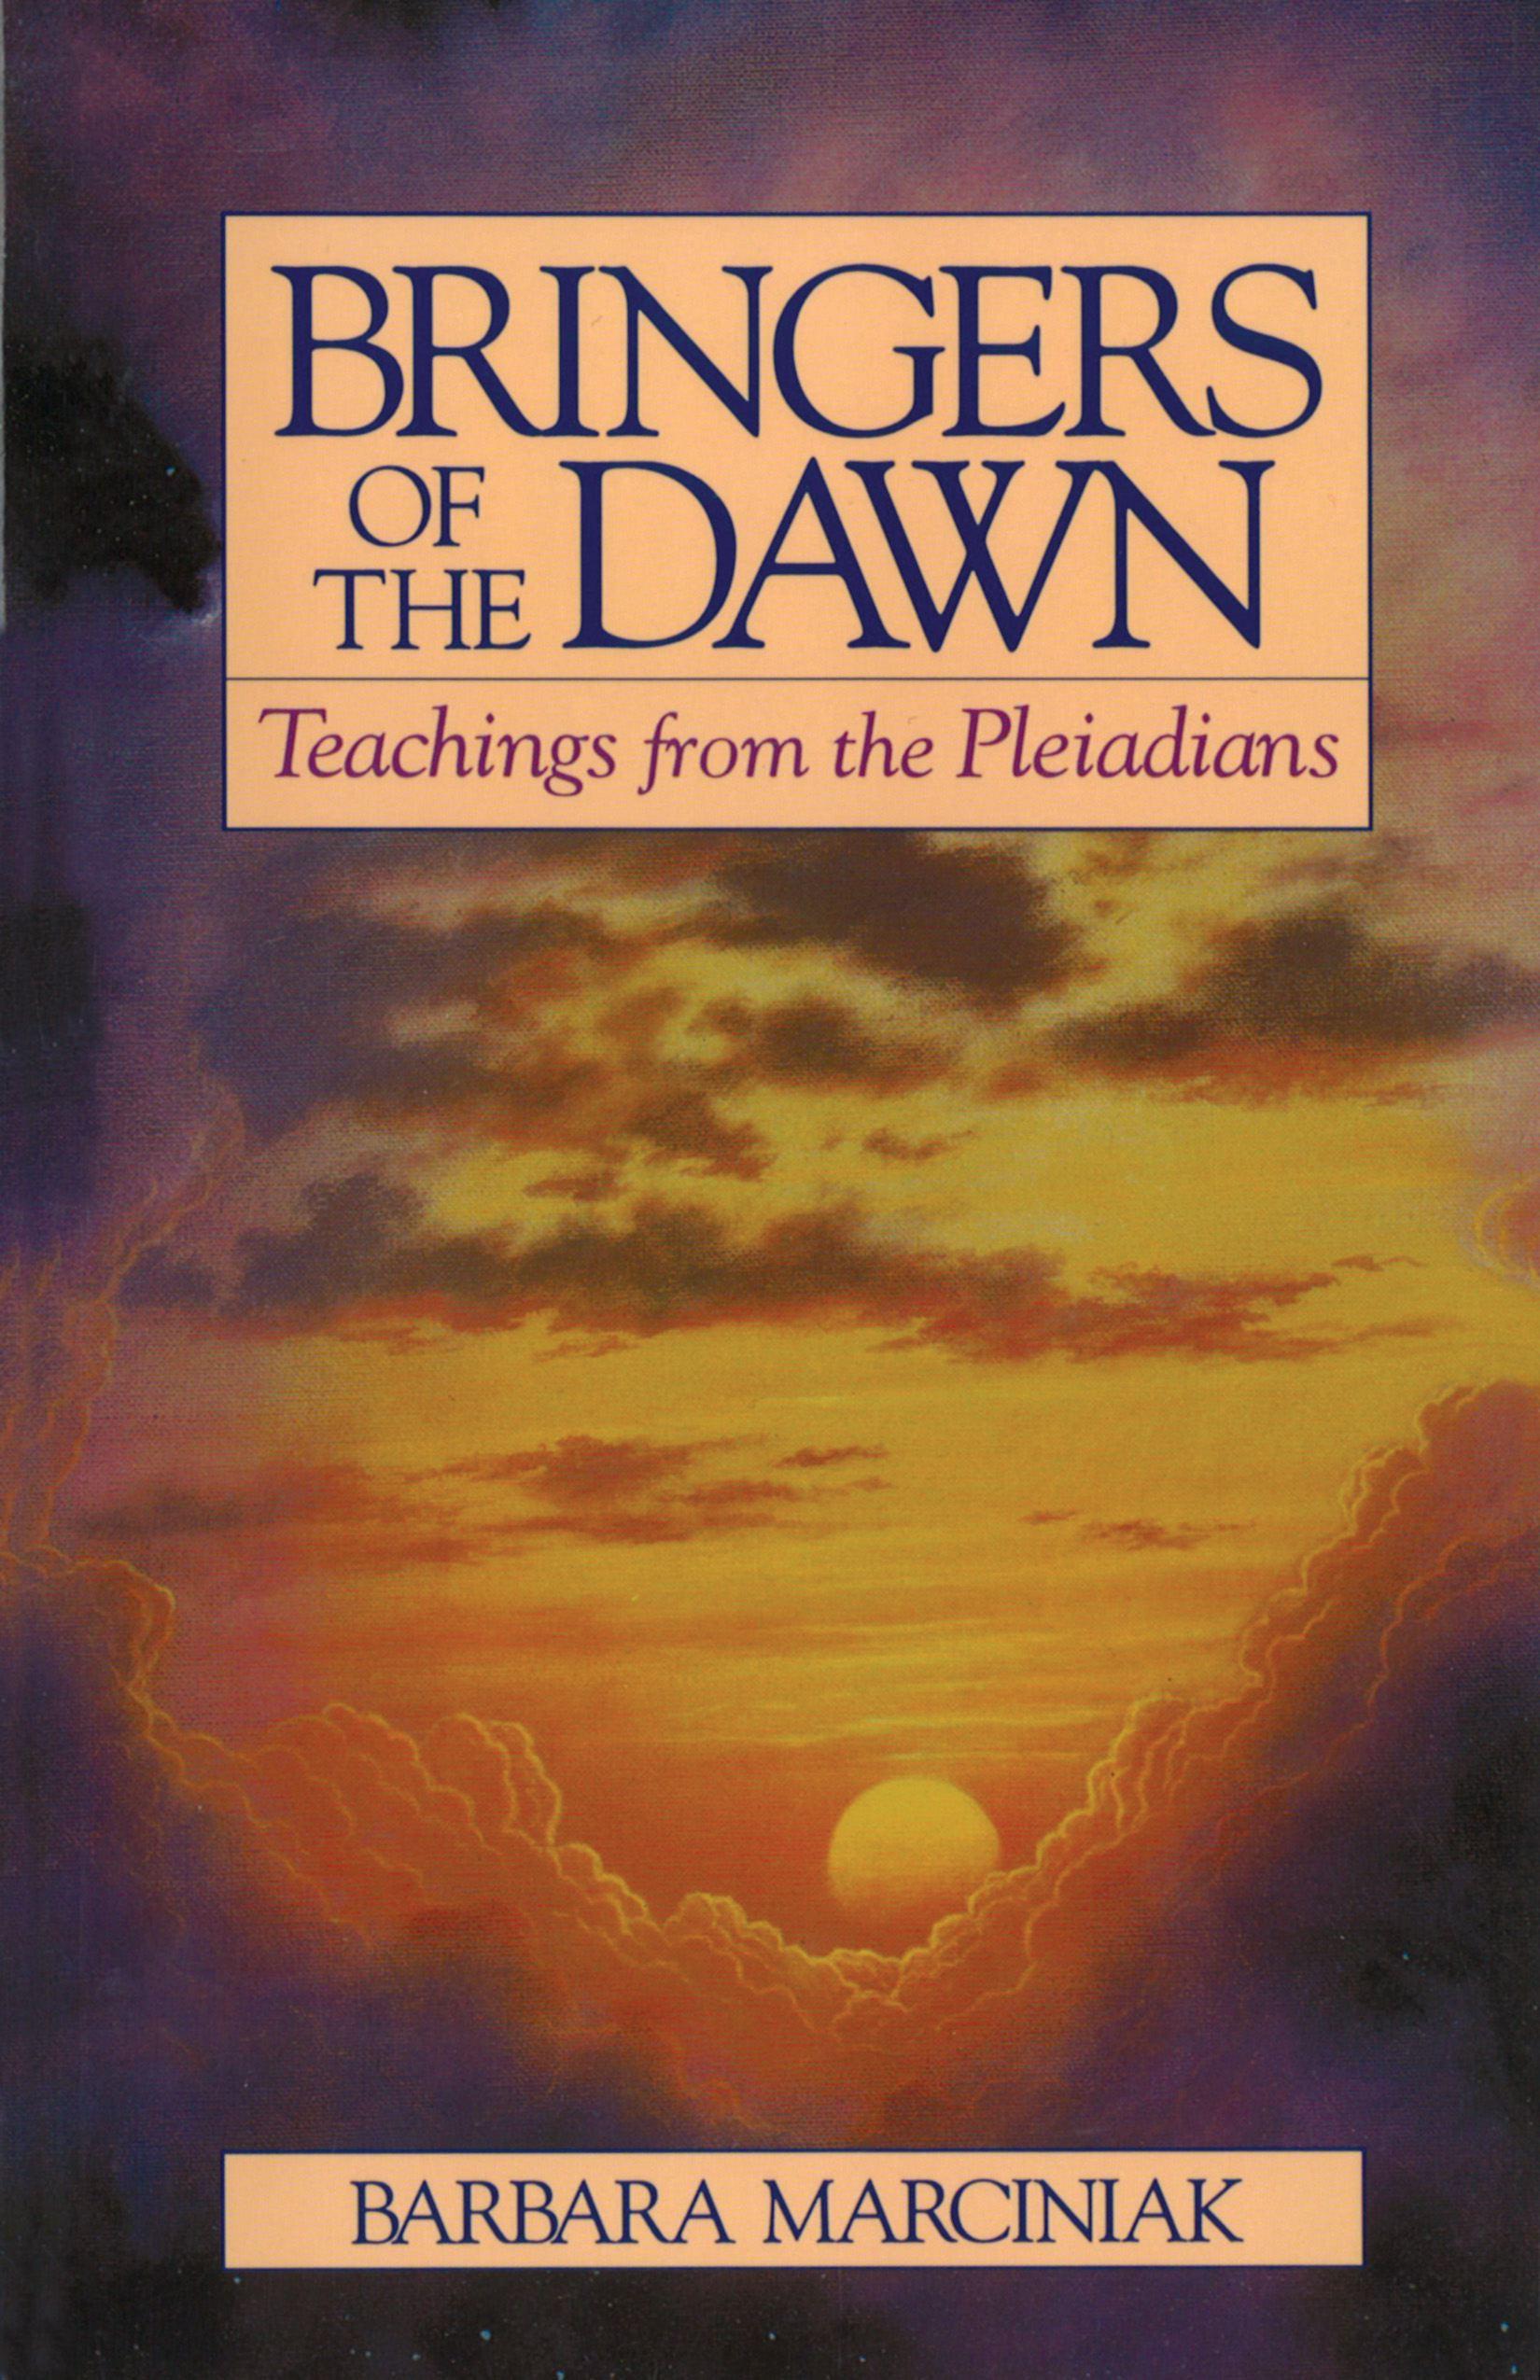 Bringers of the dawn 9780939680986 hr